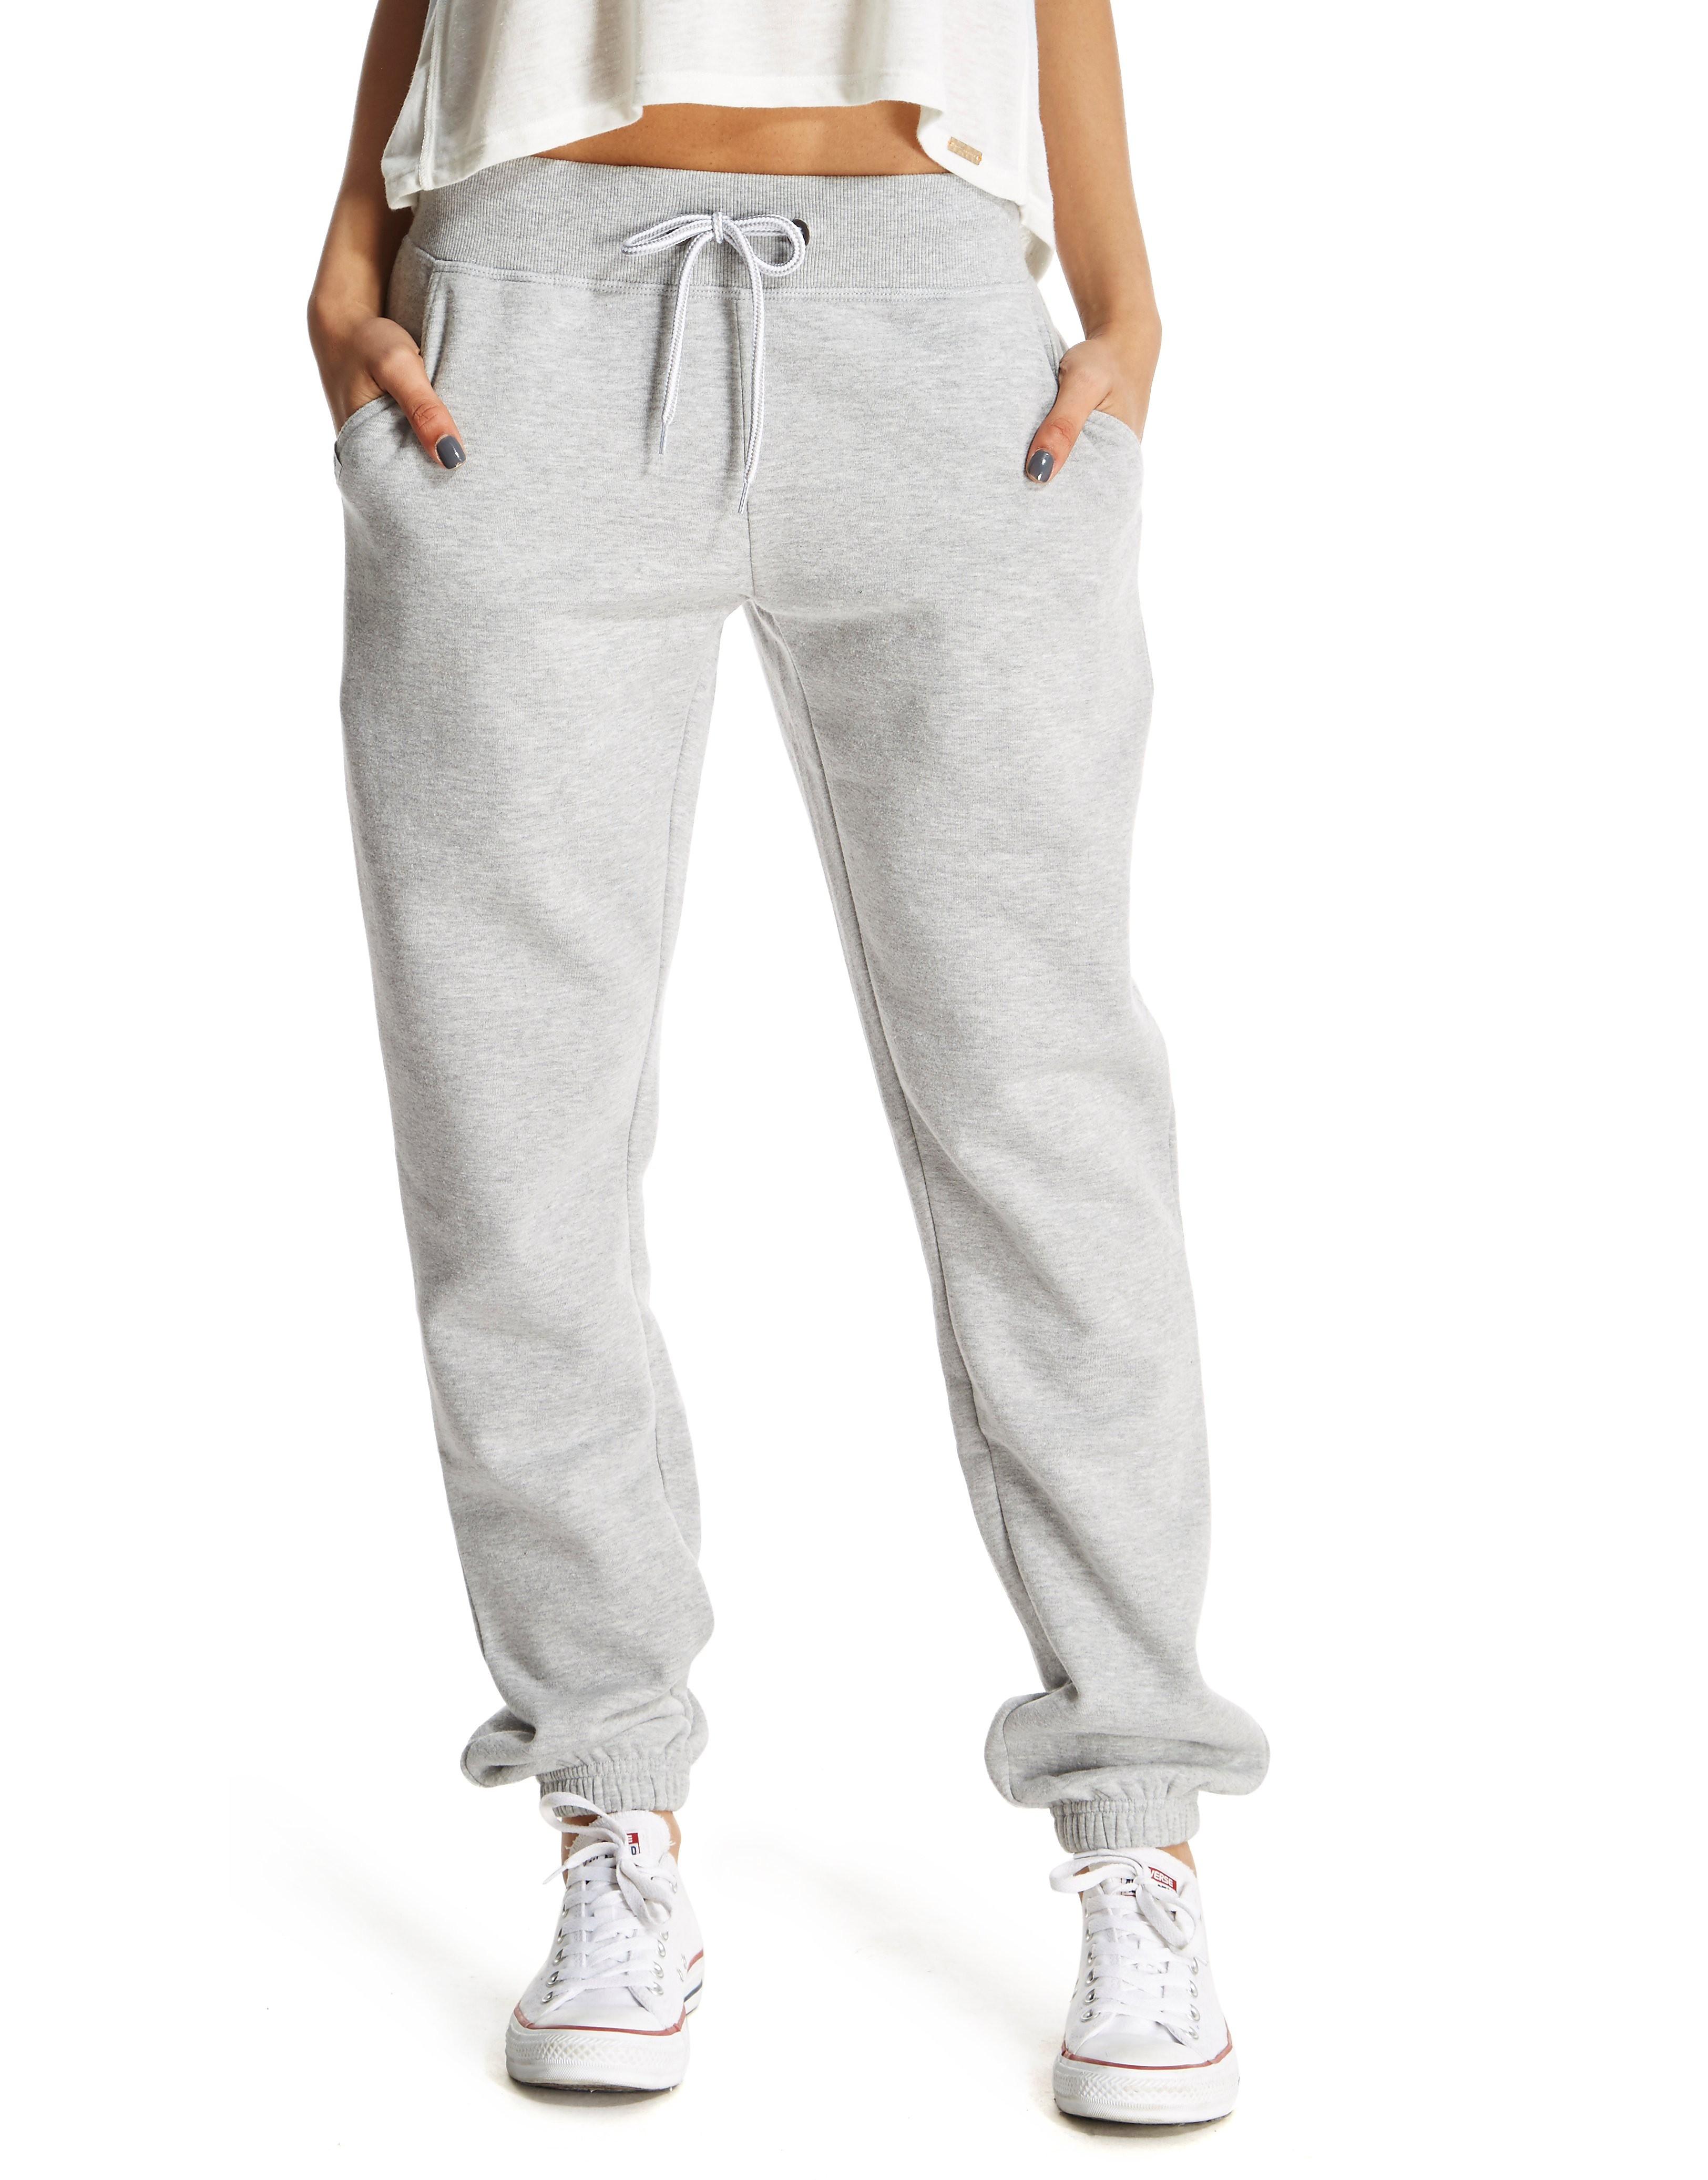 Brookhaven Candy 2 Jogging Pants